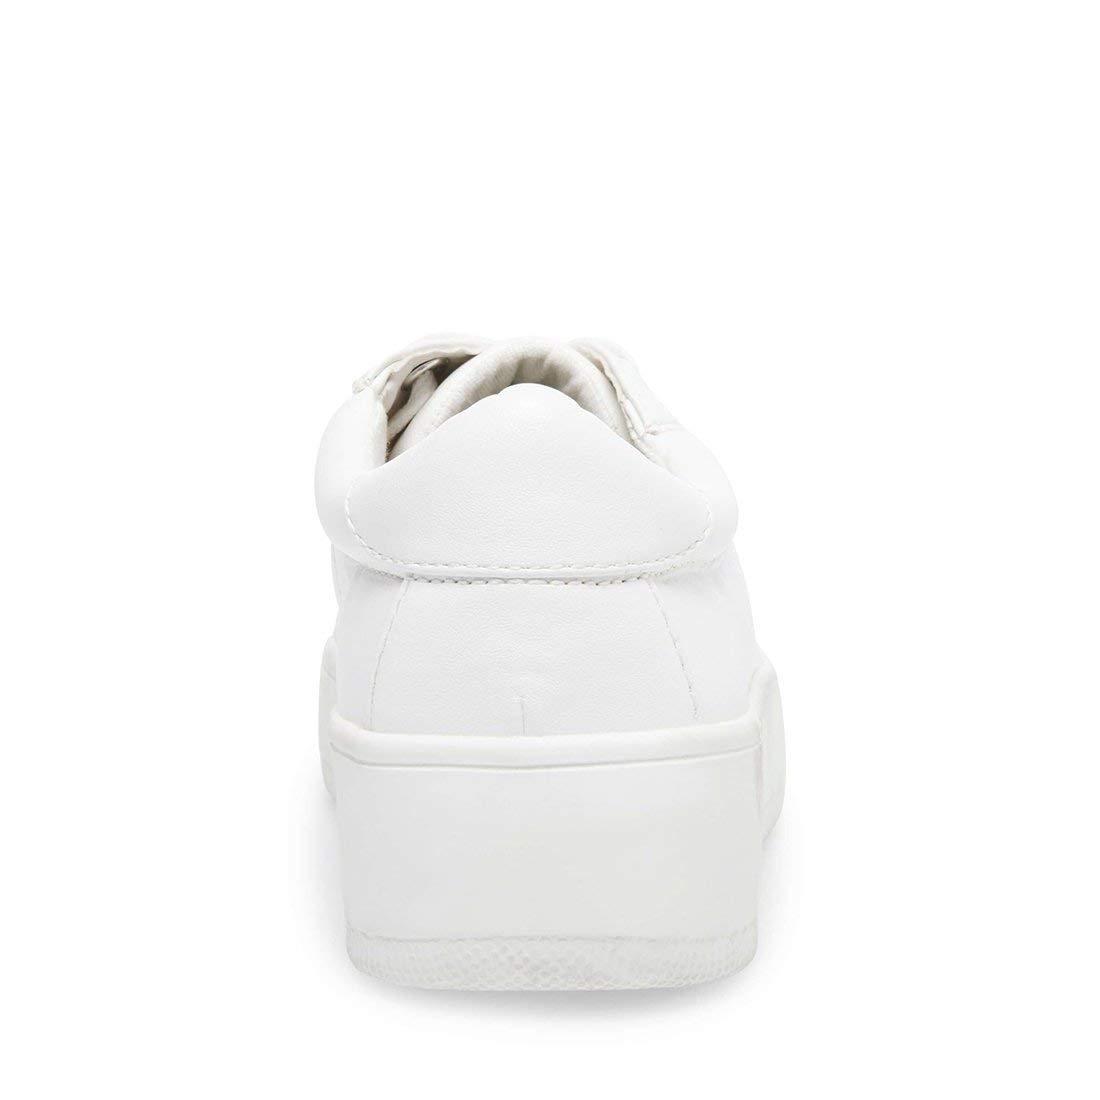 Amazon.com: Steve Madden Bertie - Zapatillas para mujer ...